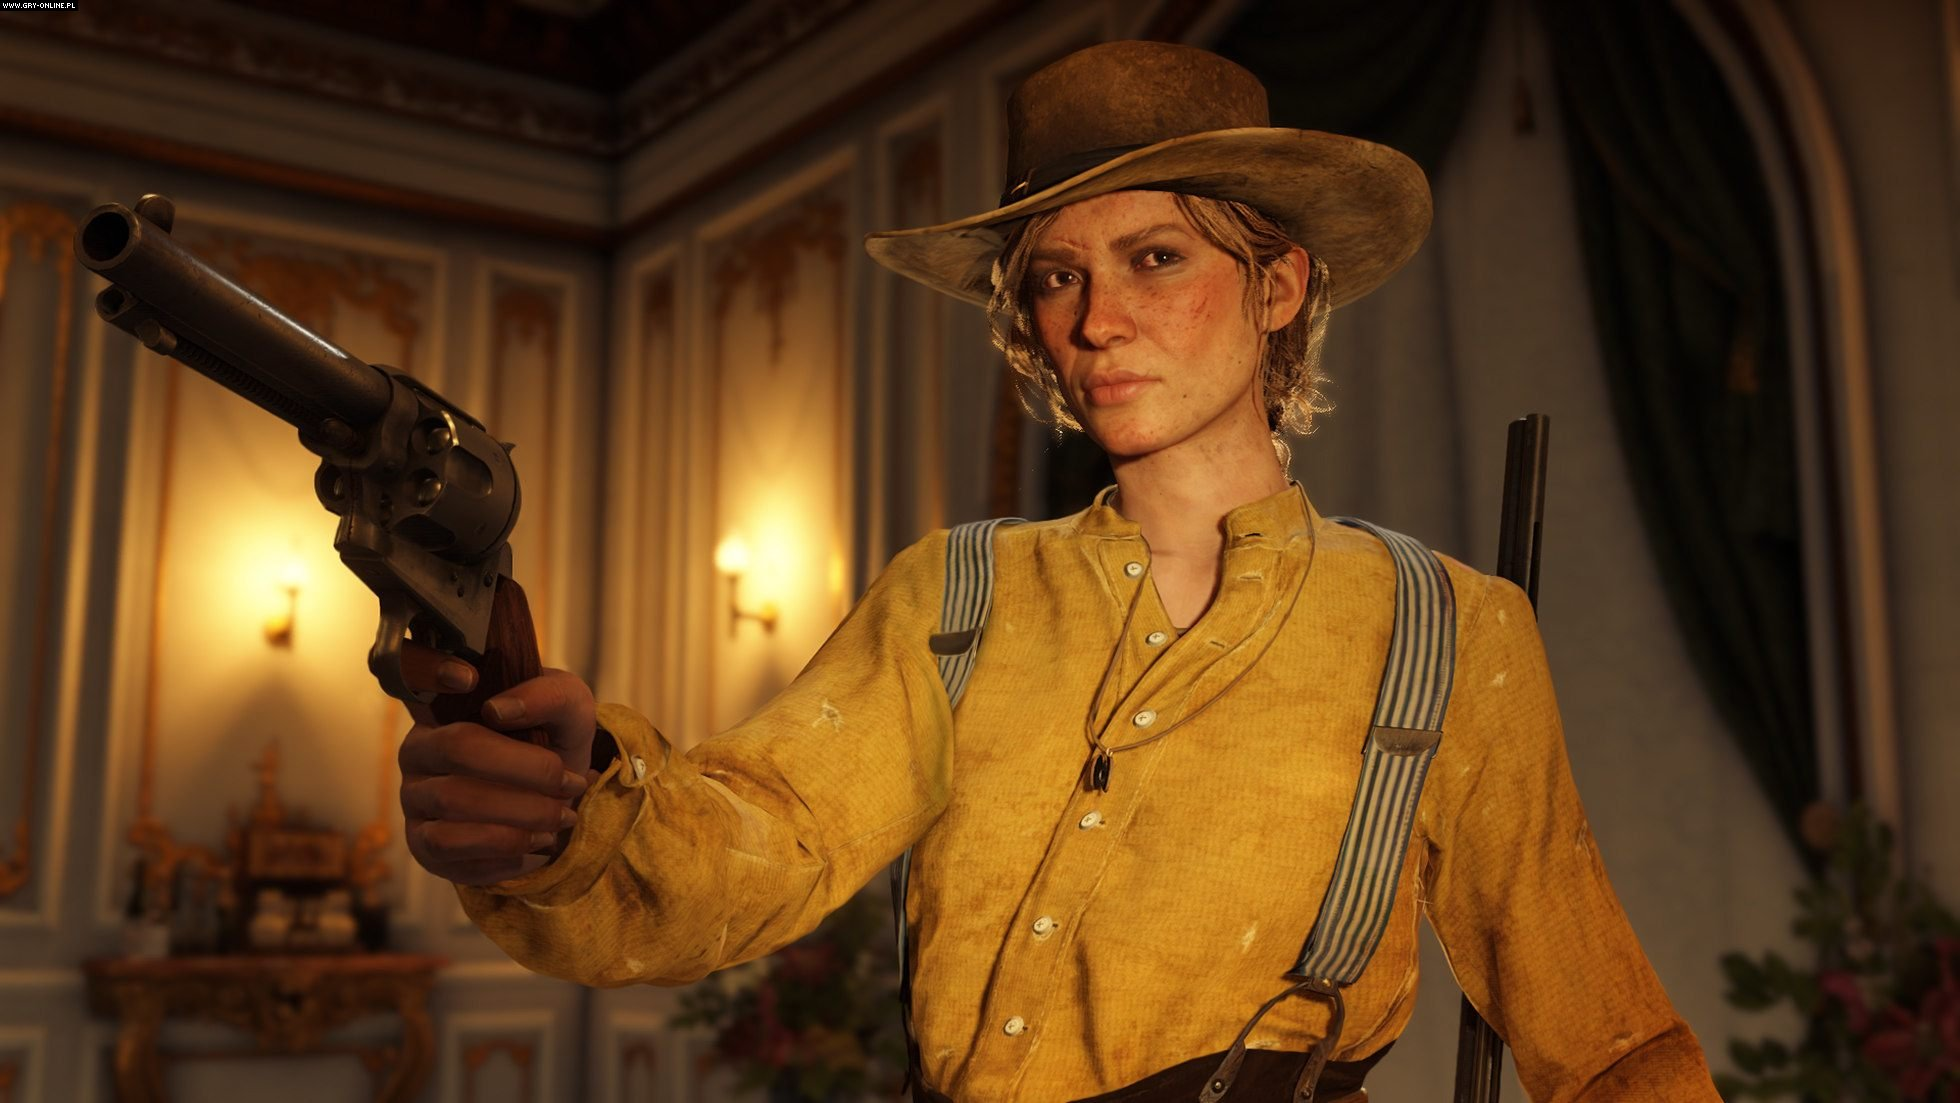 Red Dead Redemption II PS4, XONE Games Image 24/55, Rockstar Games